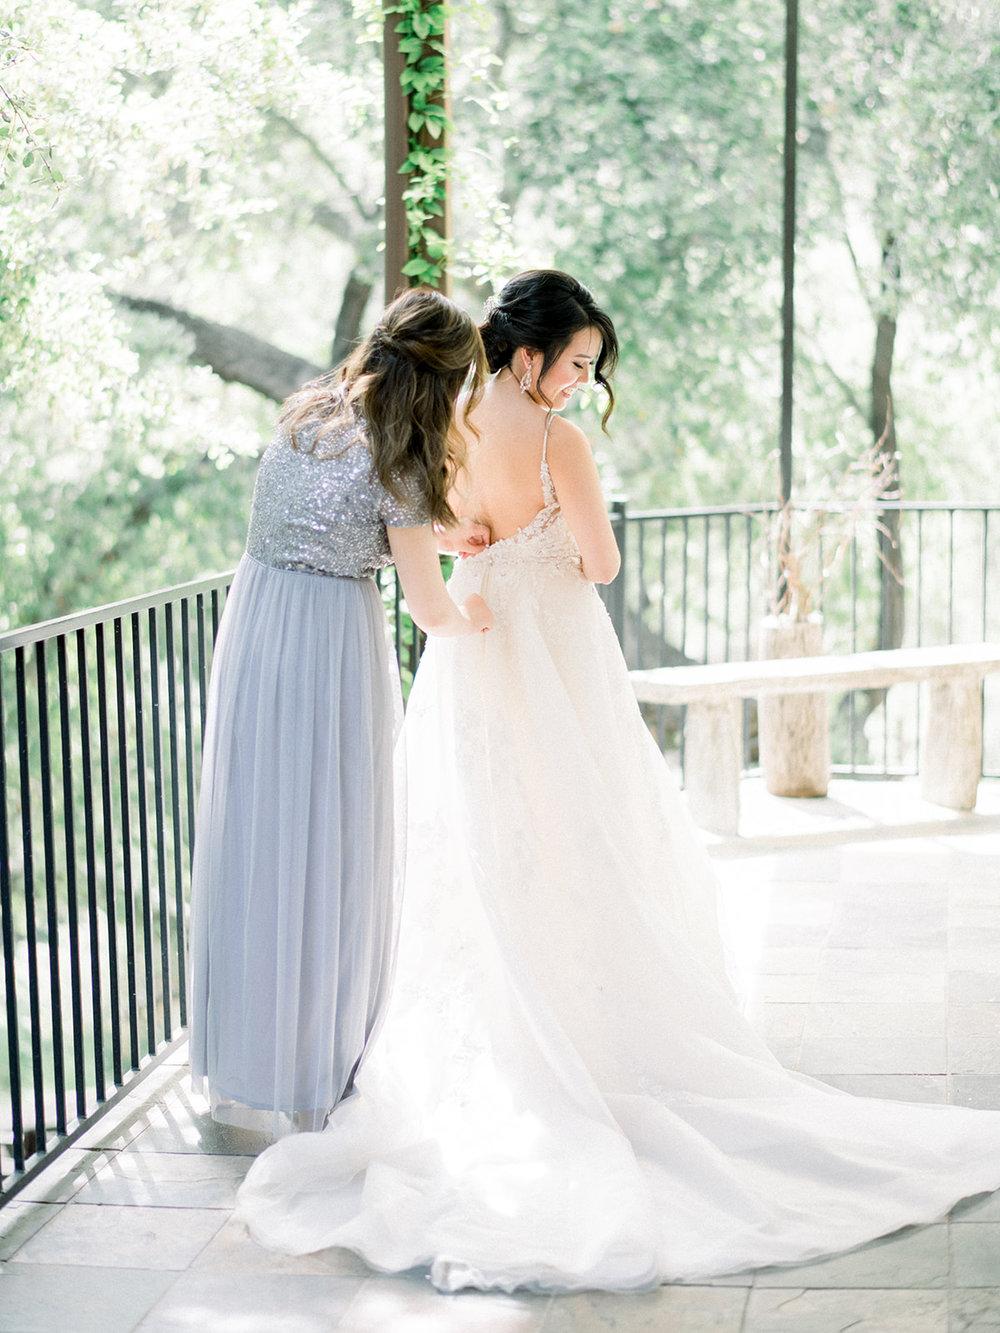 jueunandjon-etherandsmith-wedding-242.jpg